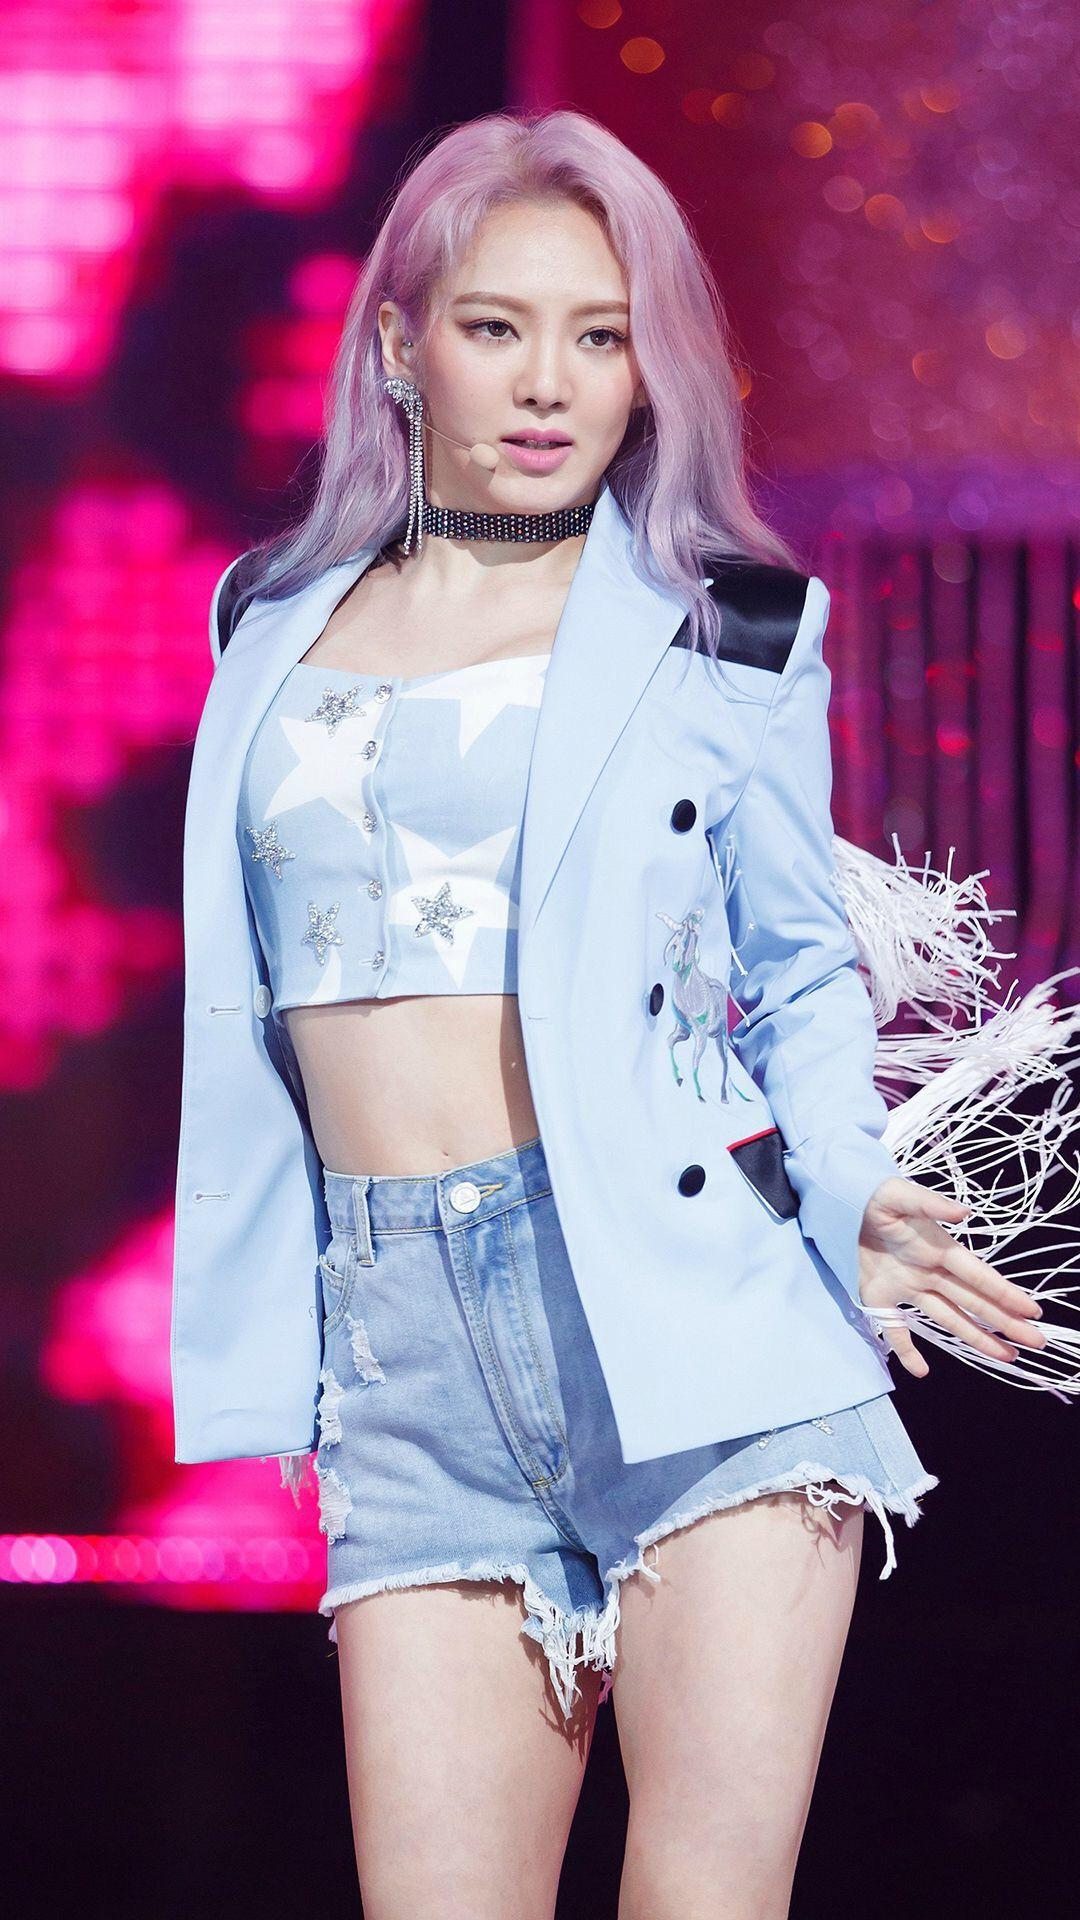 Girls' Generation's Hyoyeon